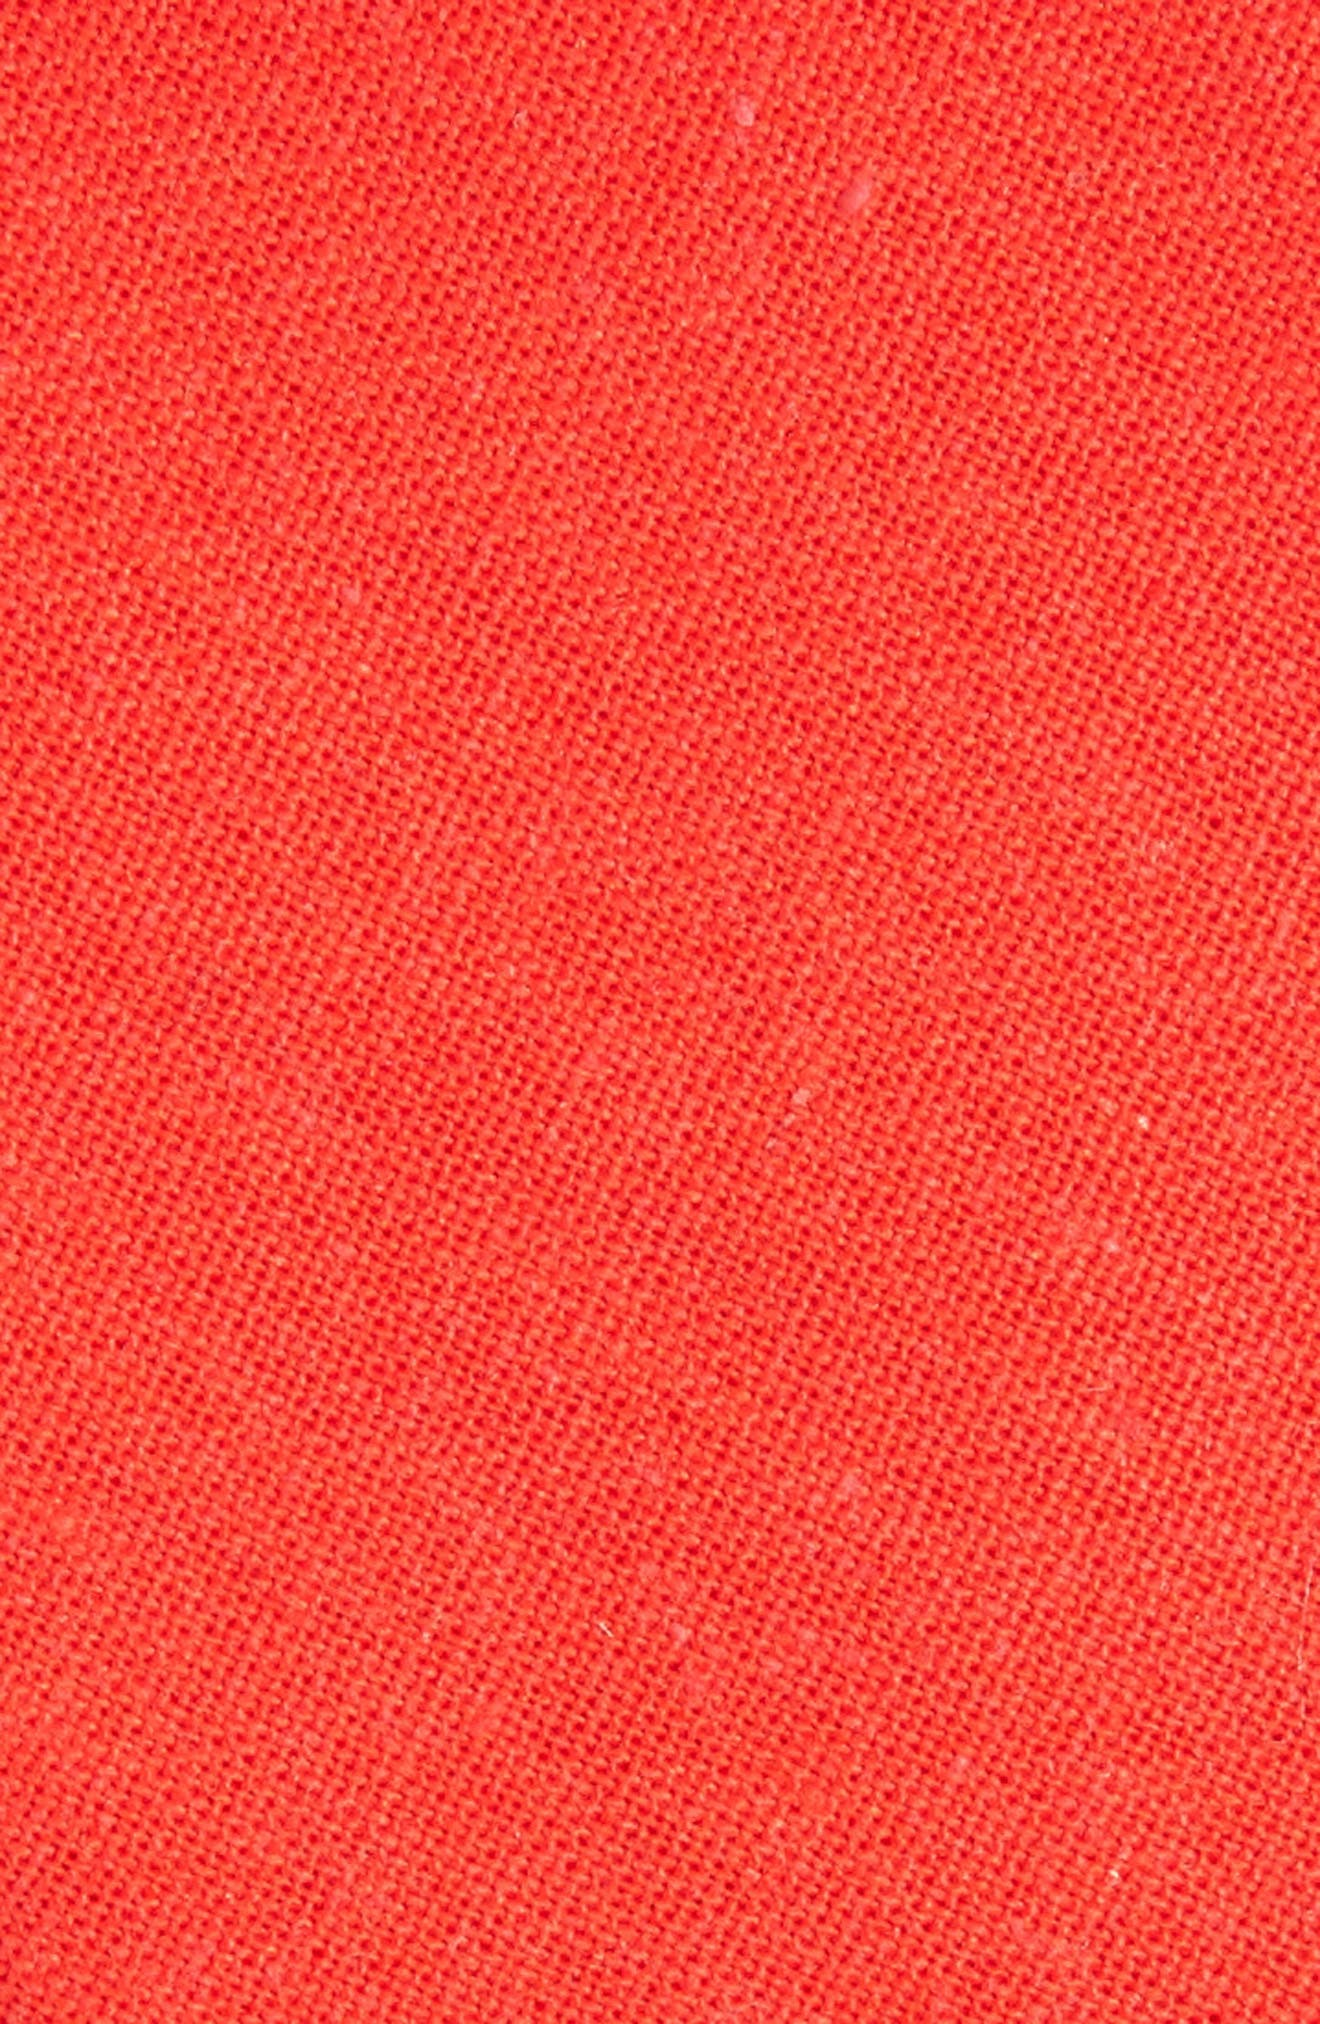 Solid Linen & Cotton Tie,                             Alternate thumbnail 2, color,                             Red